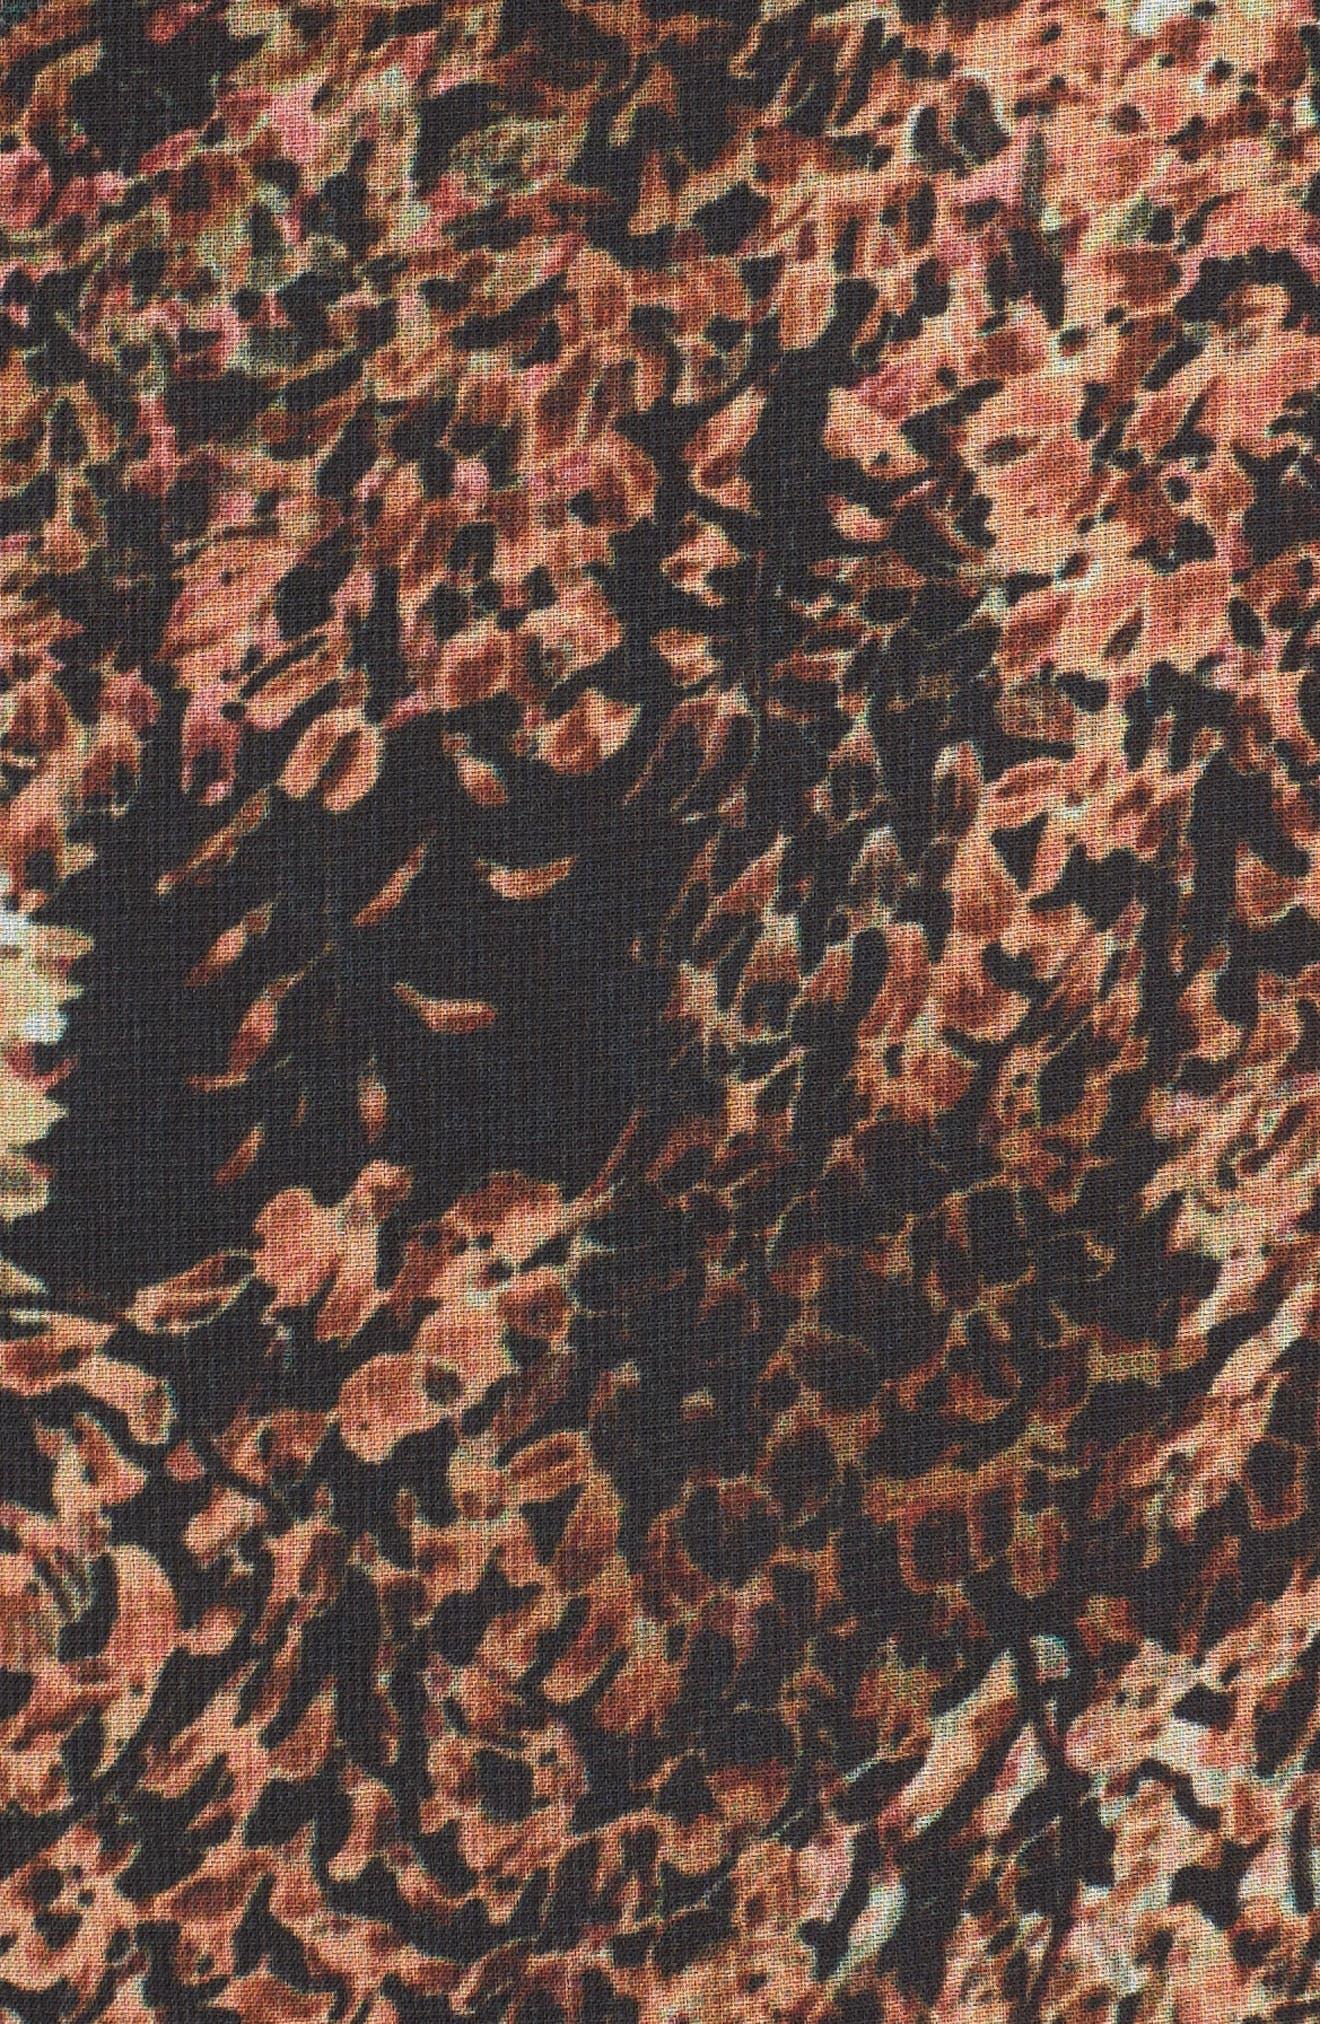 Floral Popover Drape Top,                             Alternate thumbnail 5, color,                             230